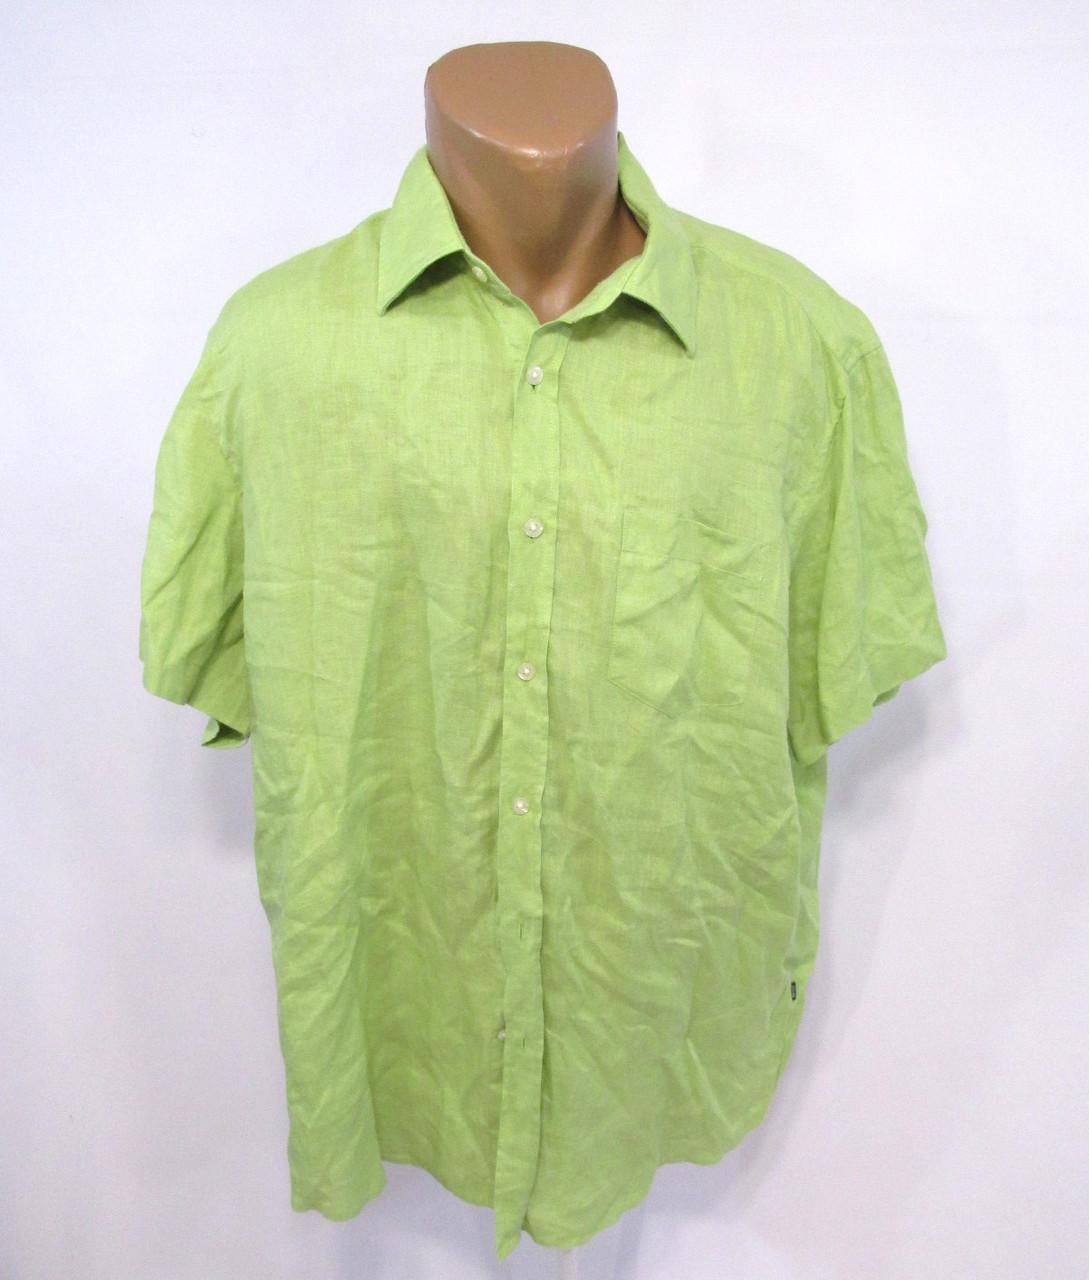 Тенниска Boss, лен, XL, зеленая, легкая, Как Новая!